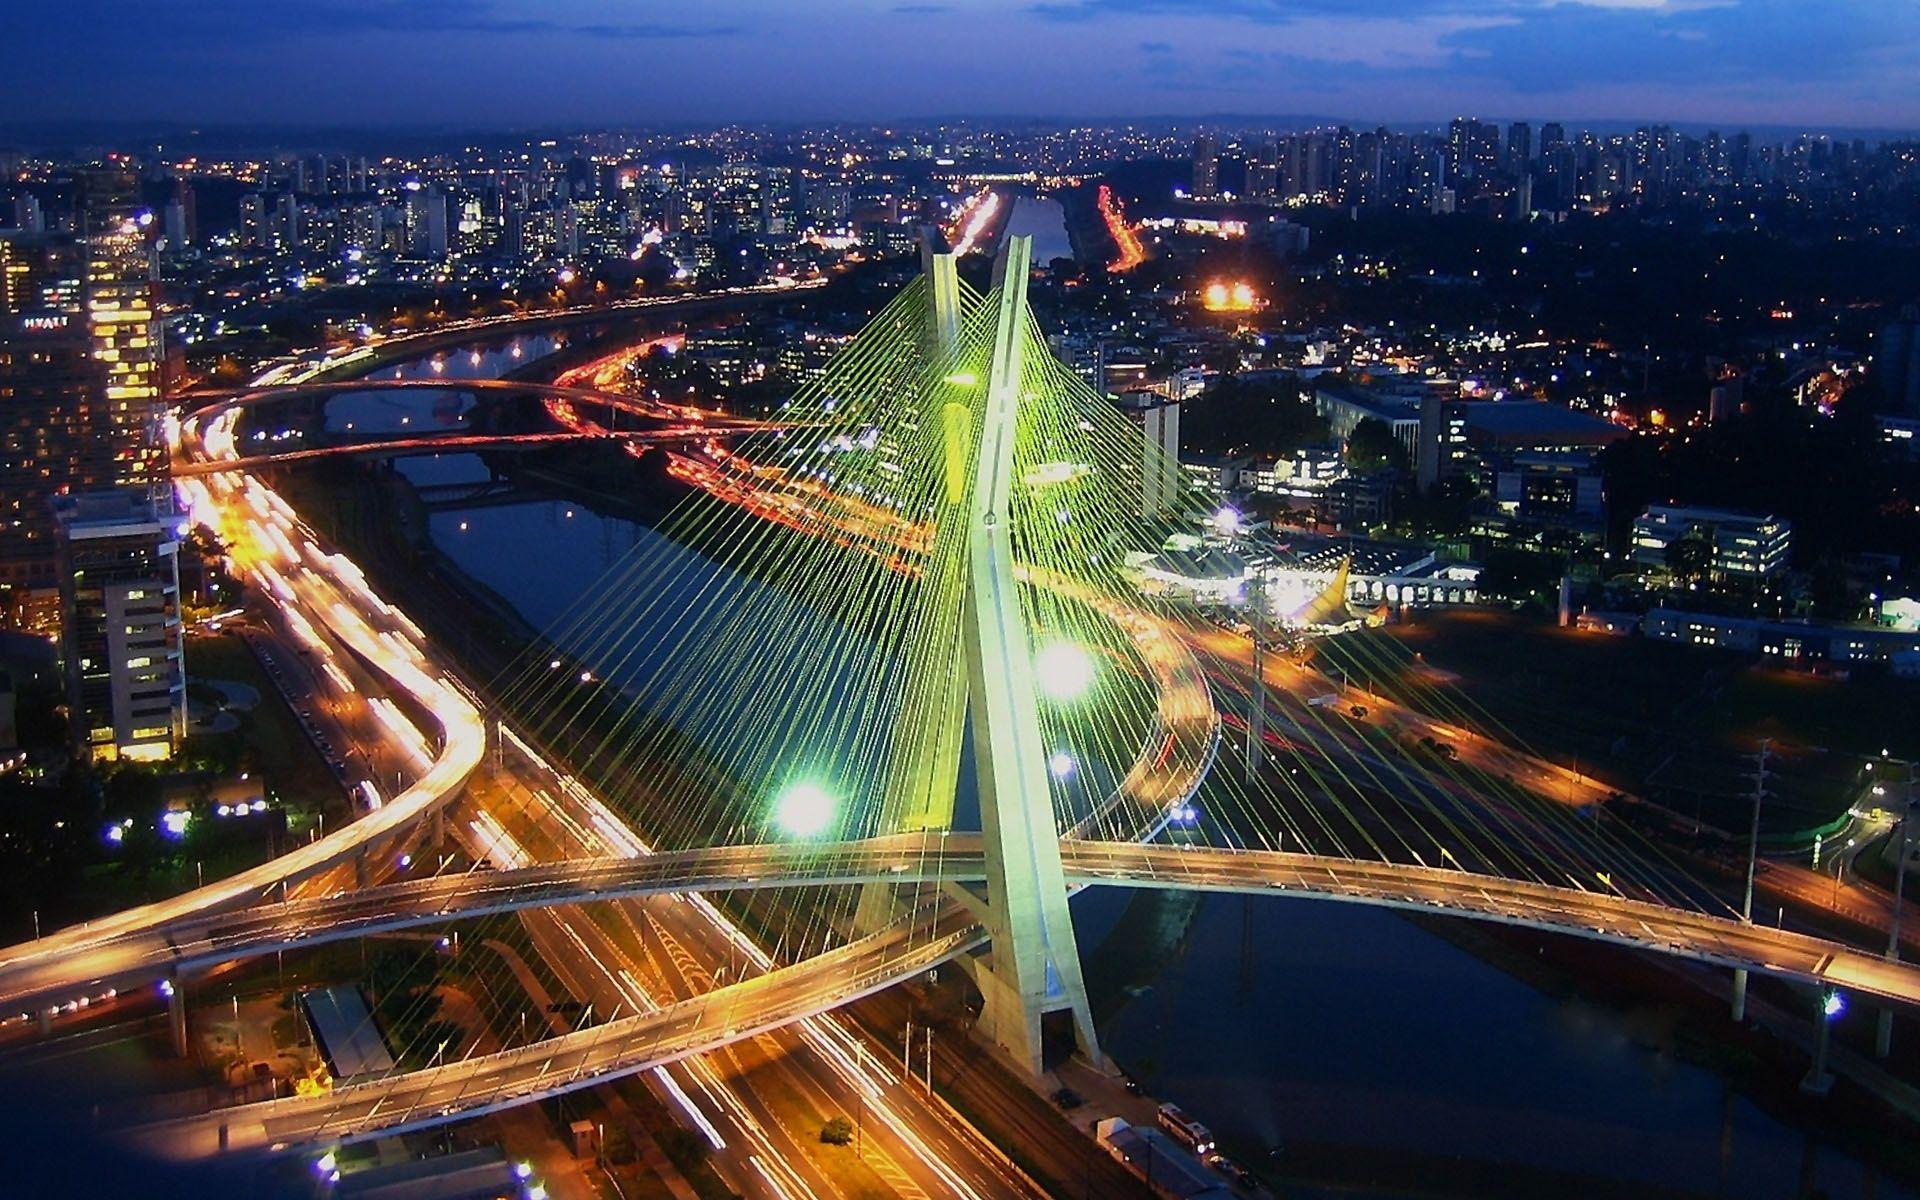 Ponte Octavio Frias - picture by Flavius Versadus